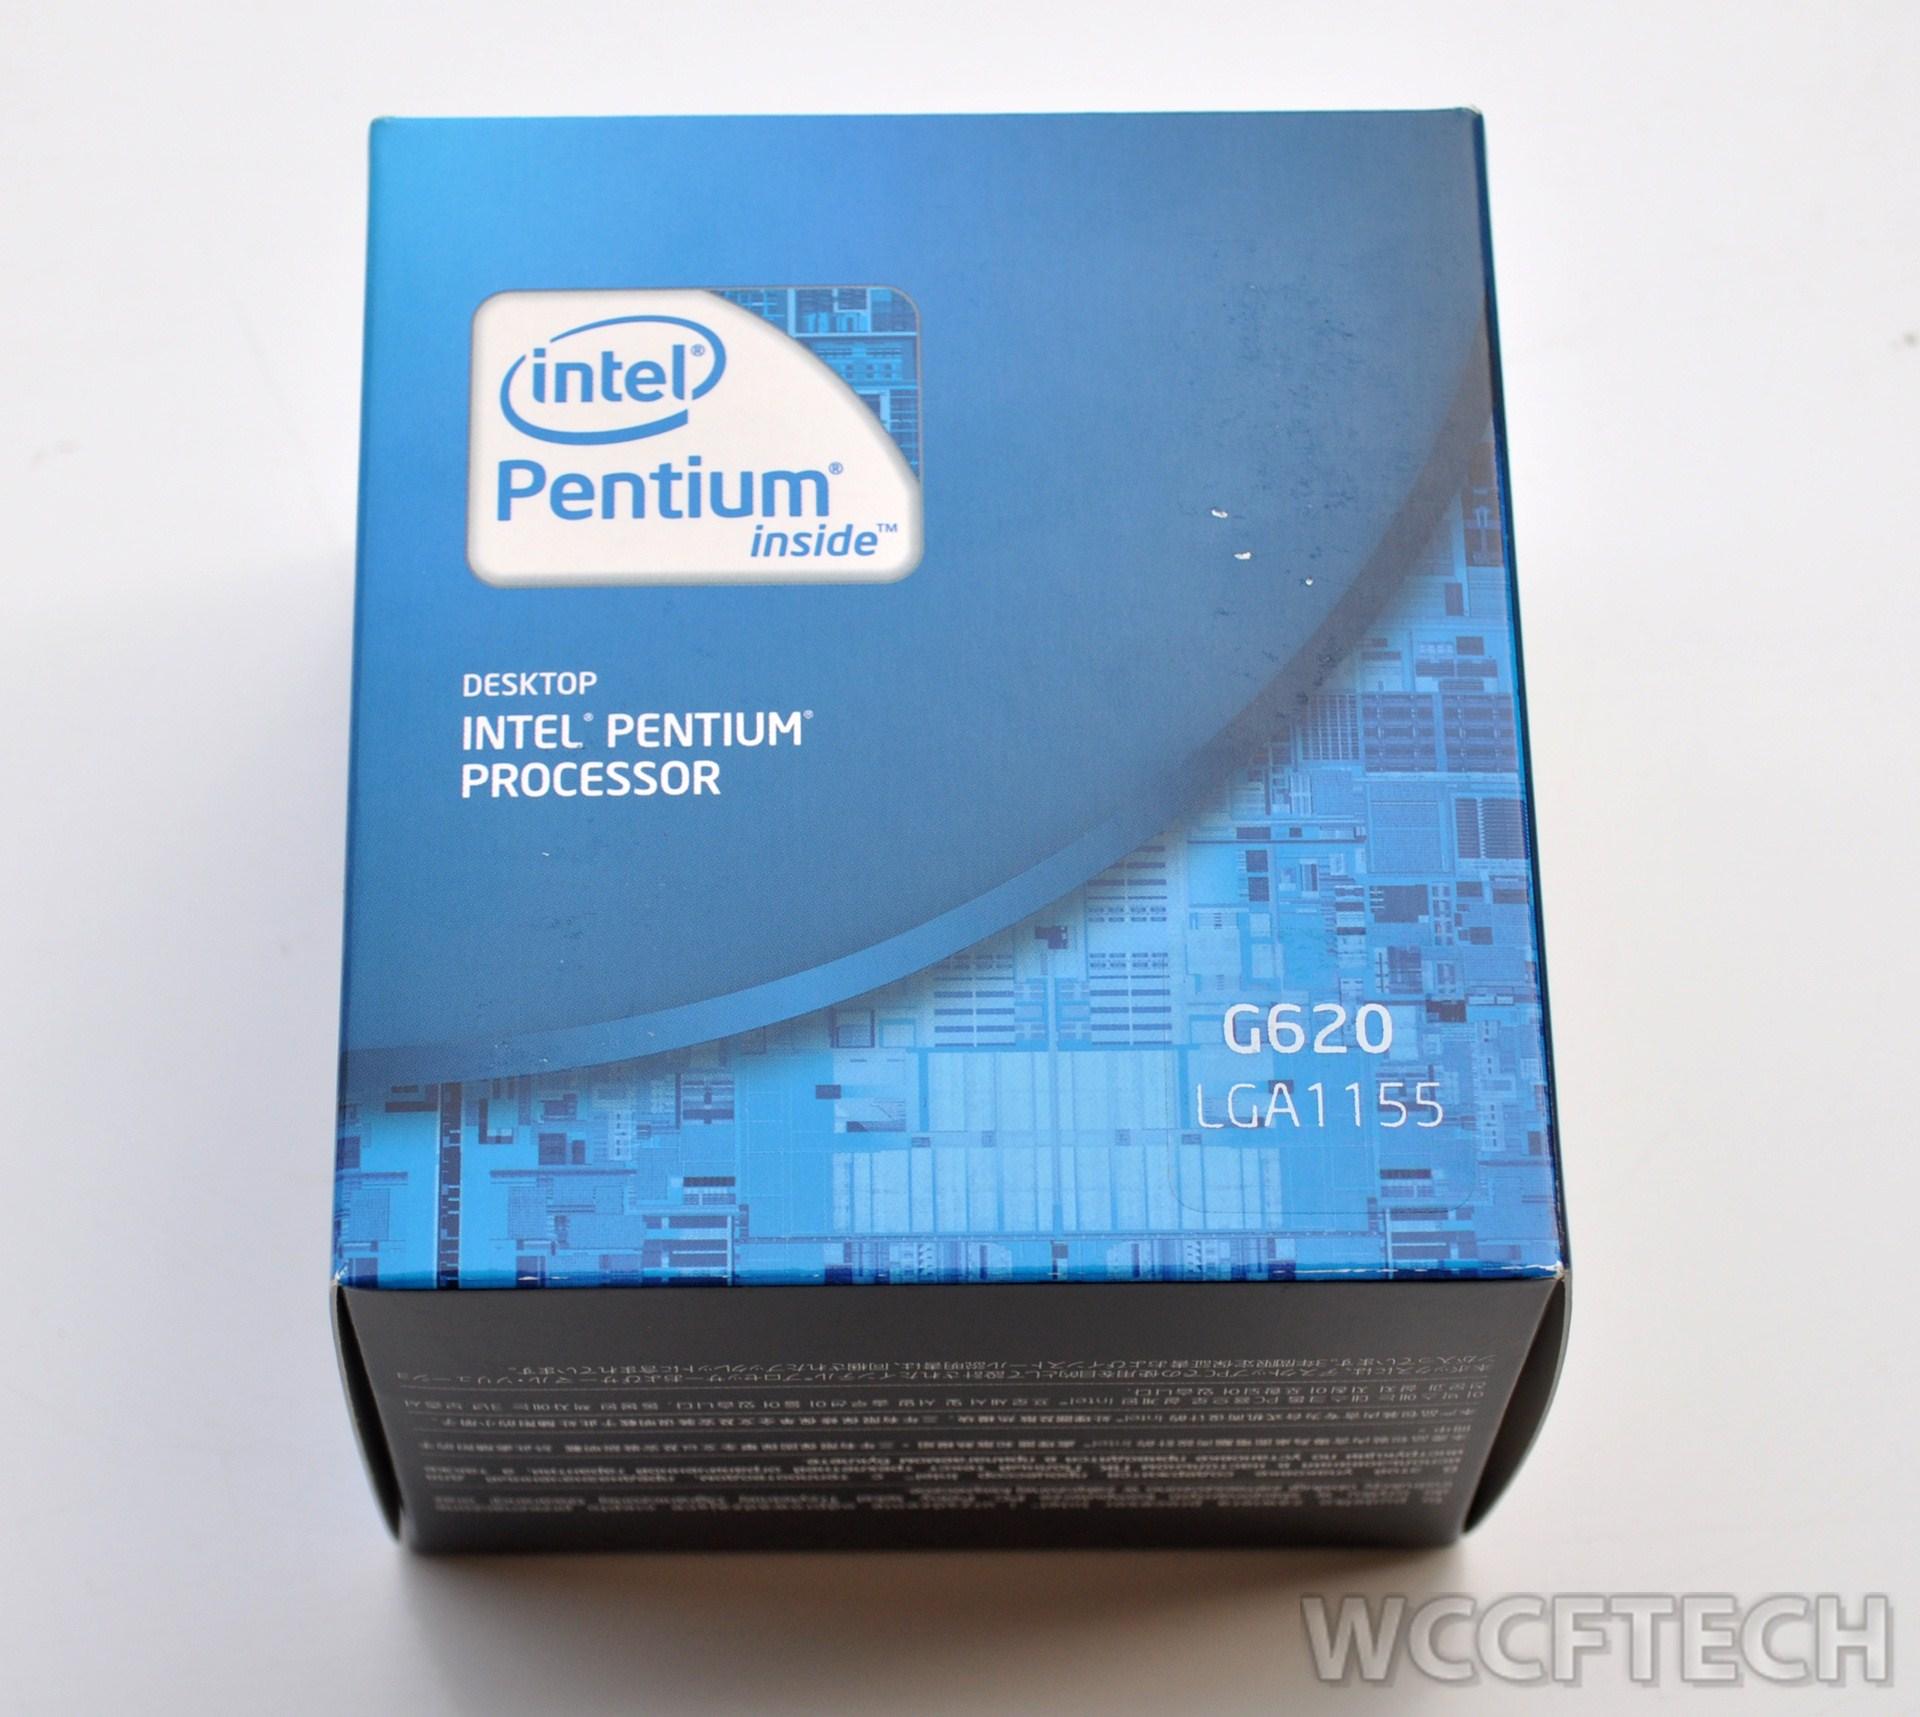 Intel Pentium G620 Lga 1155 Processor Review